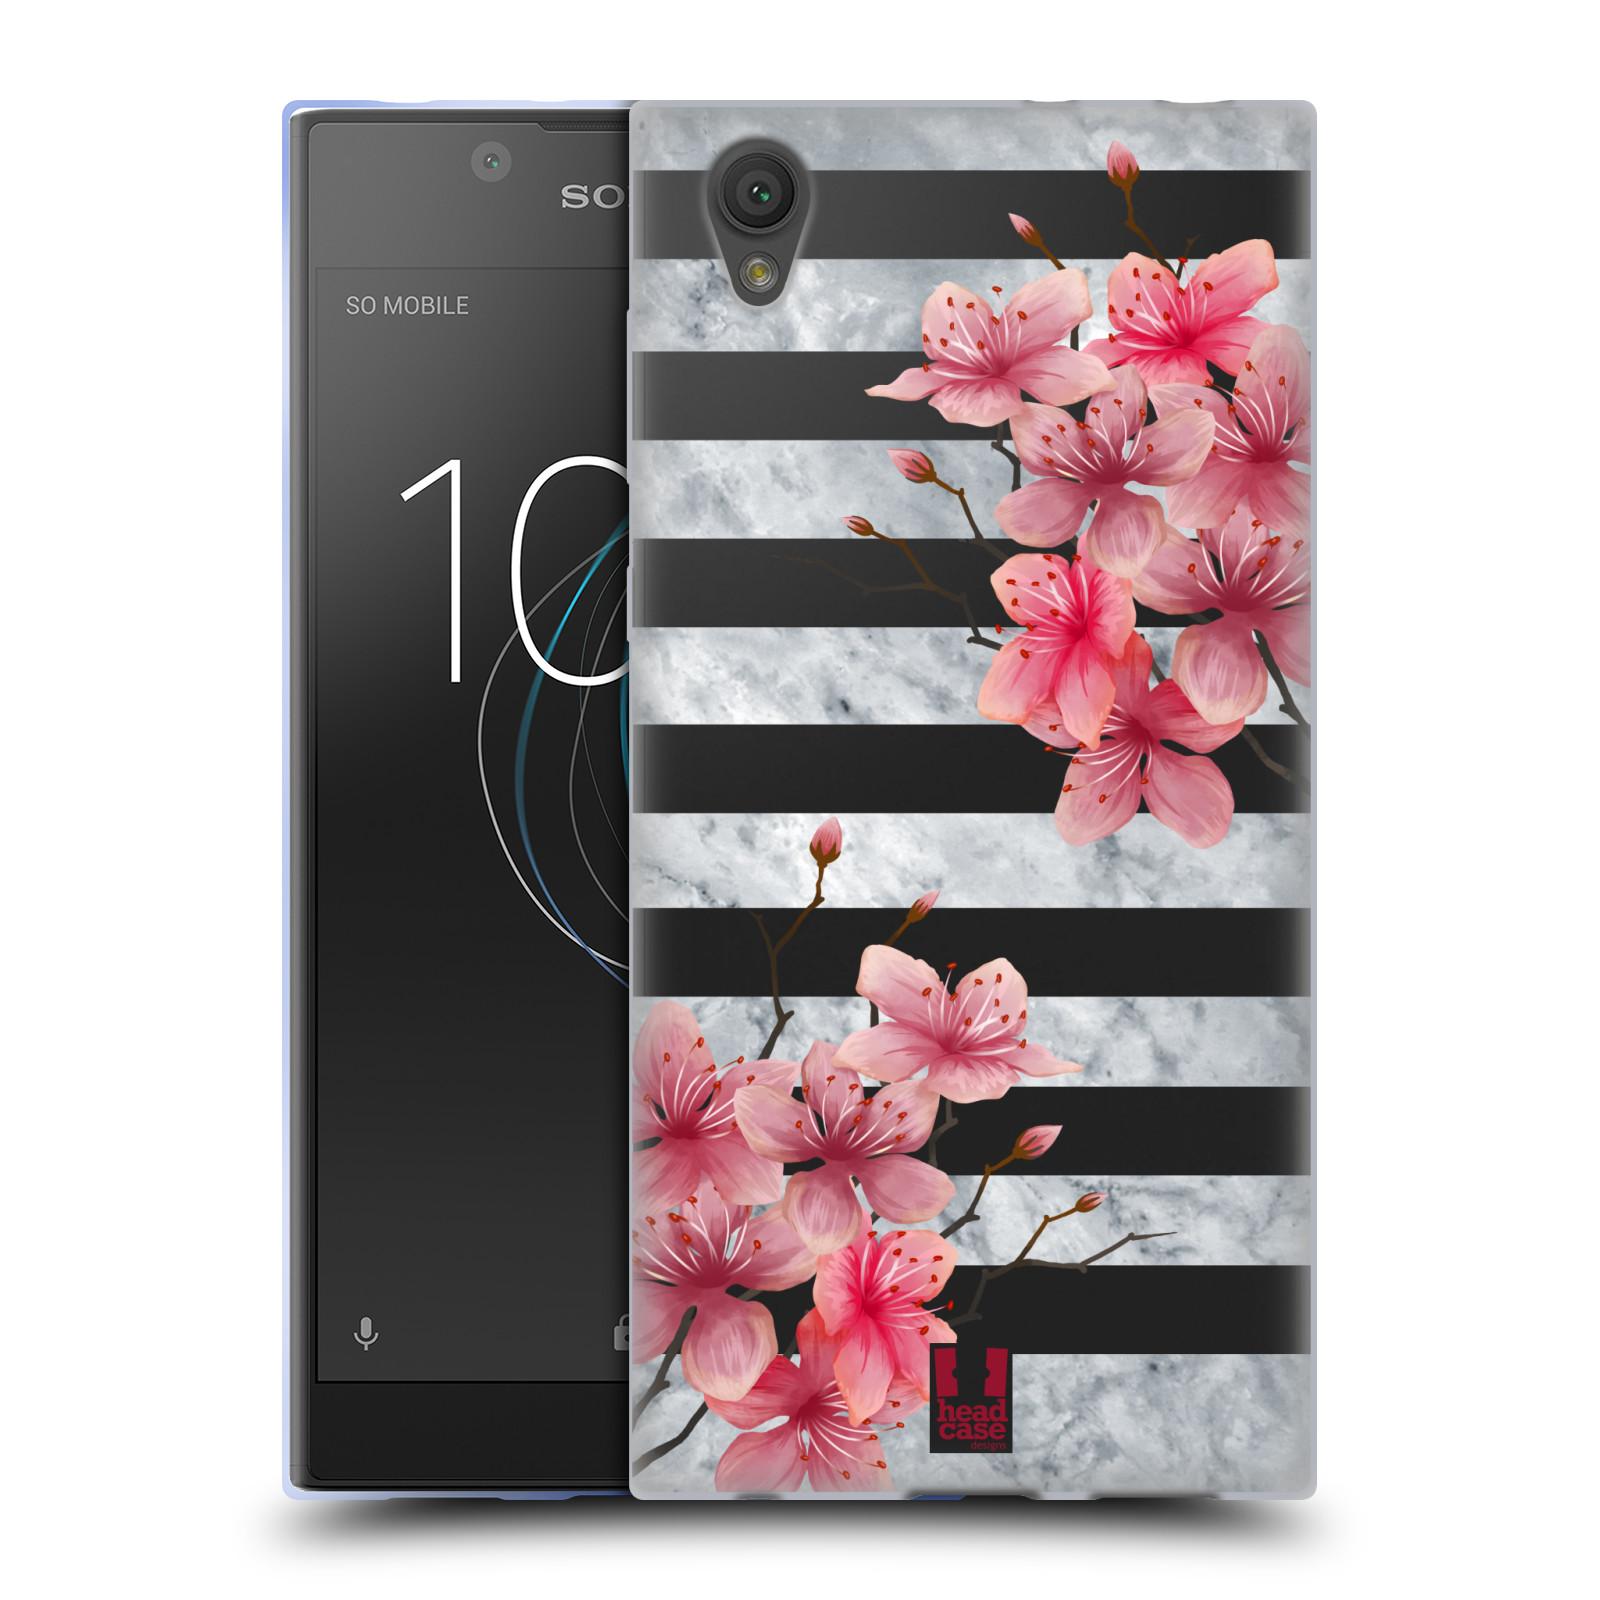 HEAD CASE silikonový obal na mobil Sony Xperia L1 růžové květy v rozkvětu a mramor